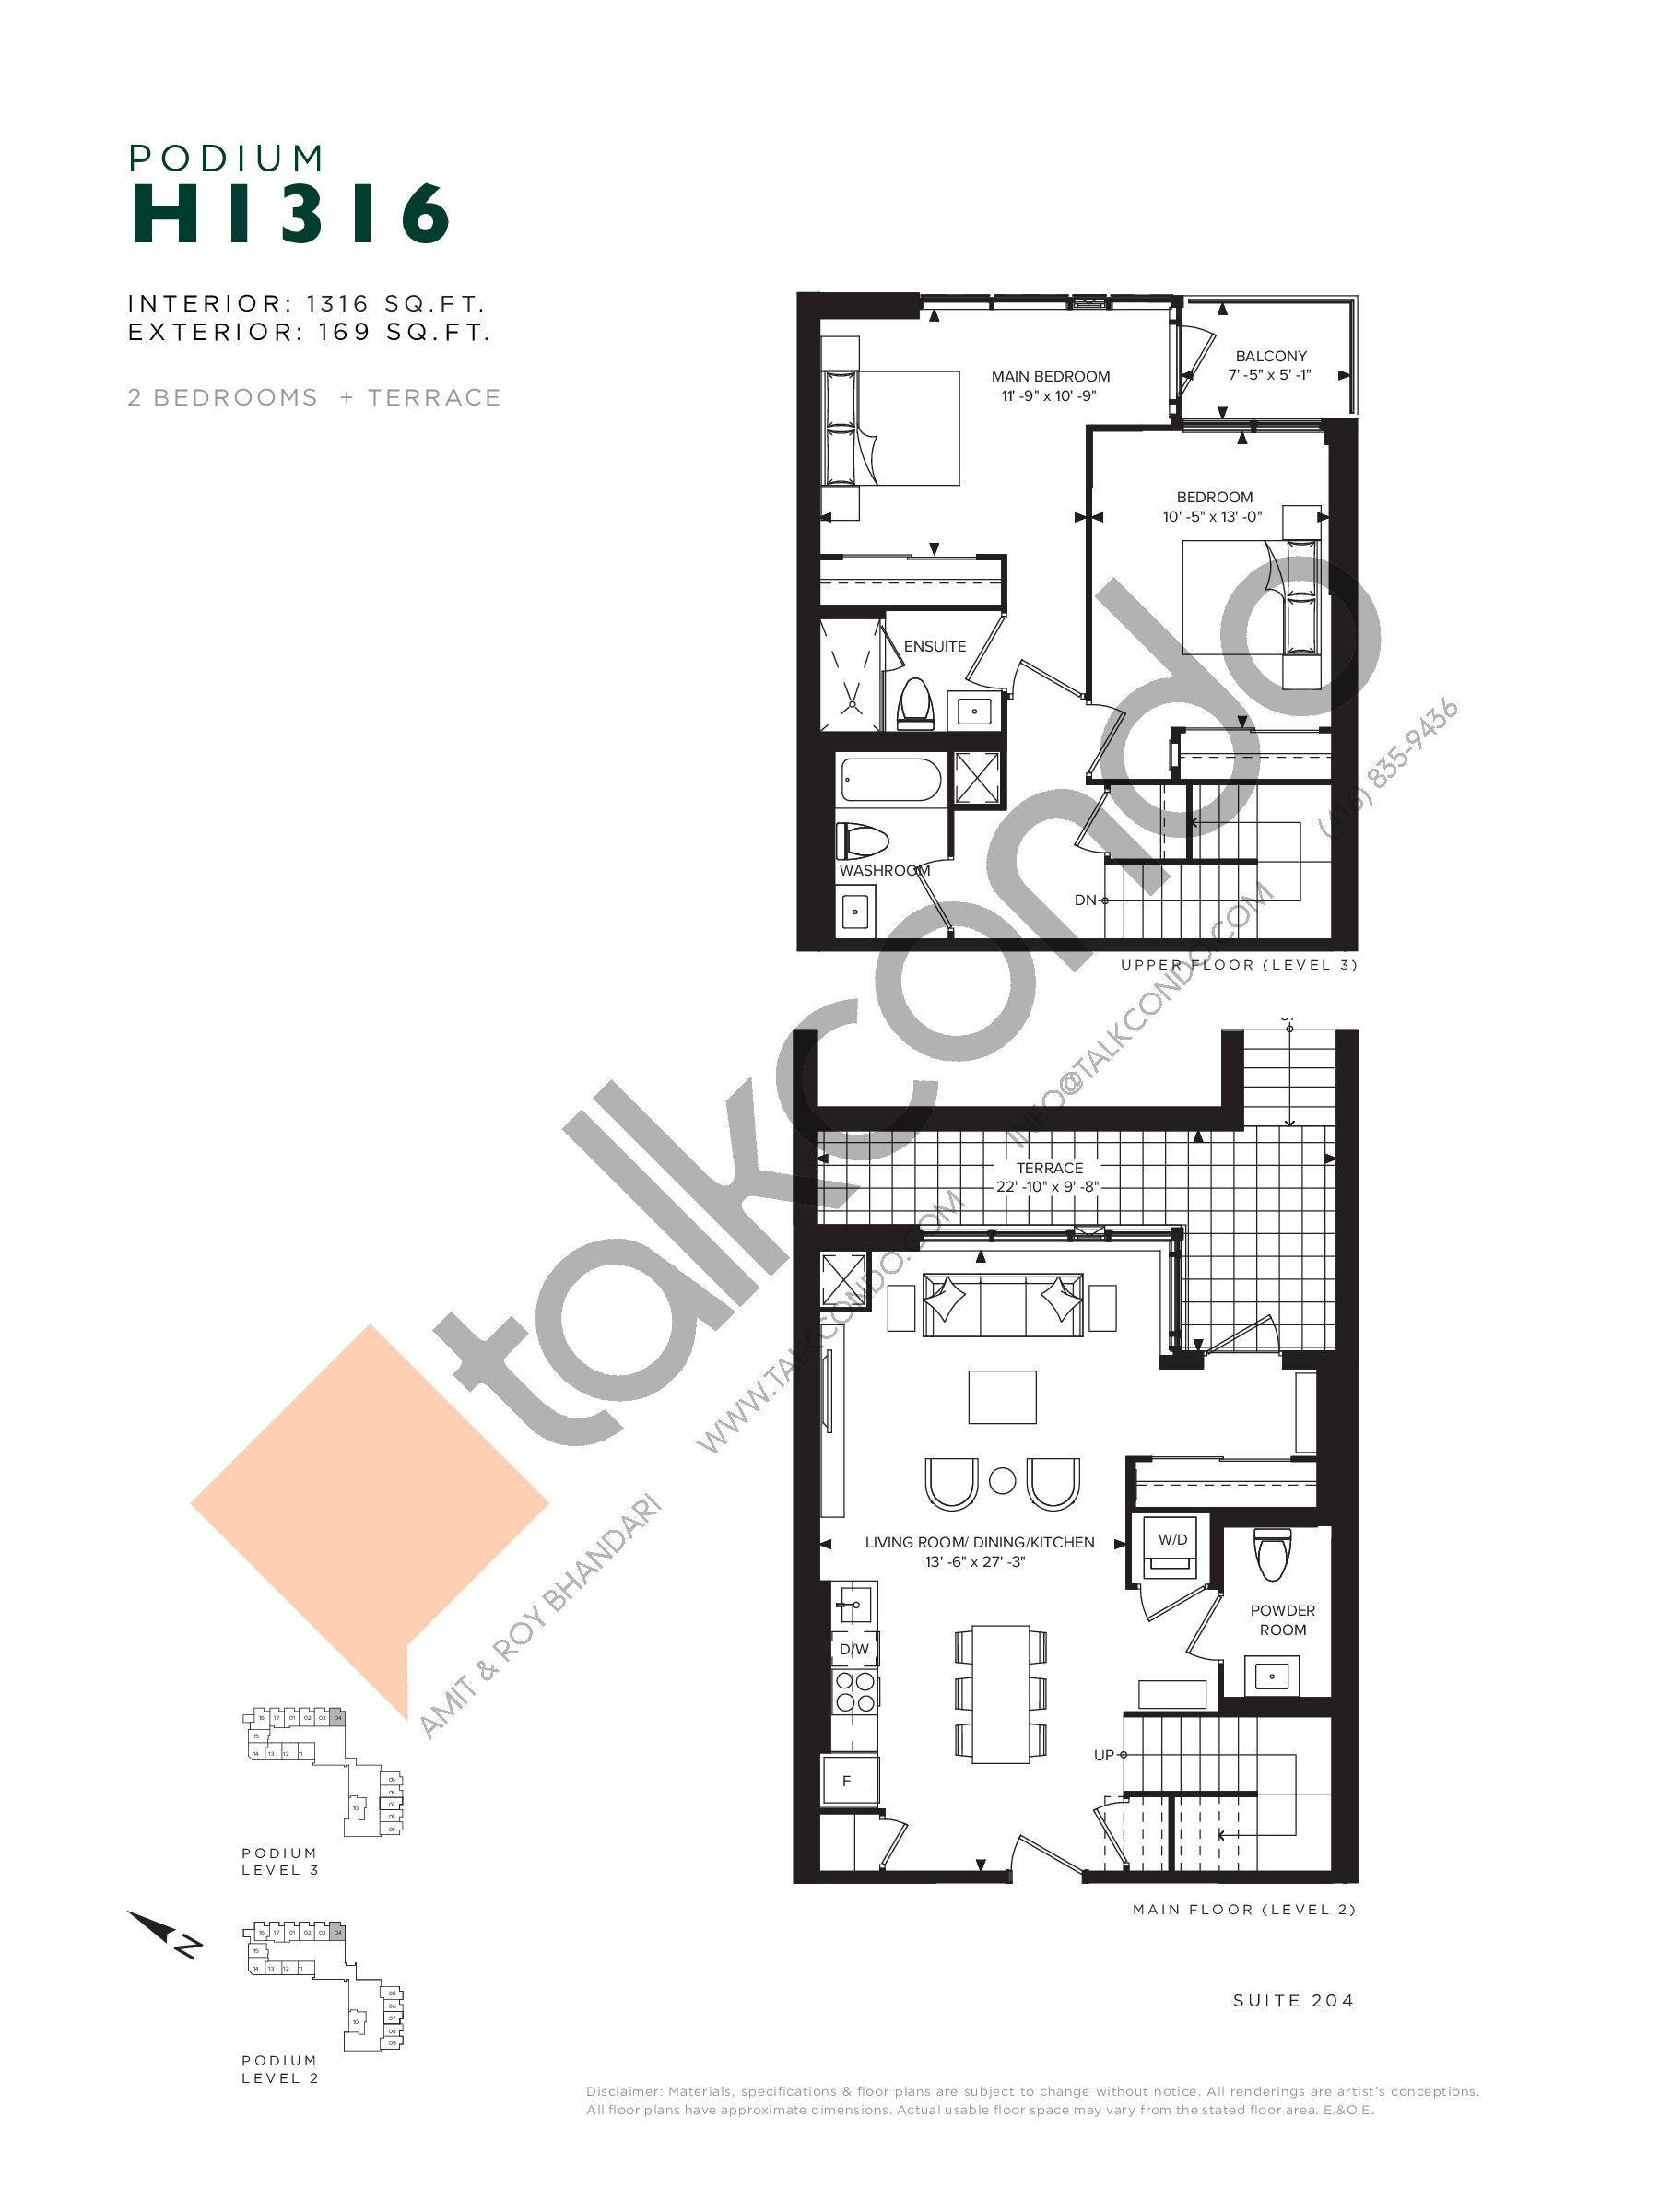 H1316 (Podium) Floor Plan at Hillmont at SXSW Condos - 1316 sq.ft